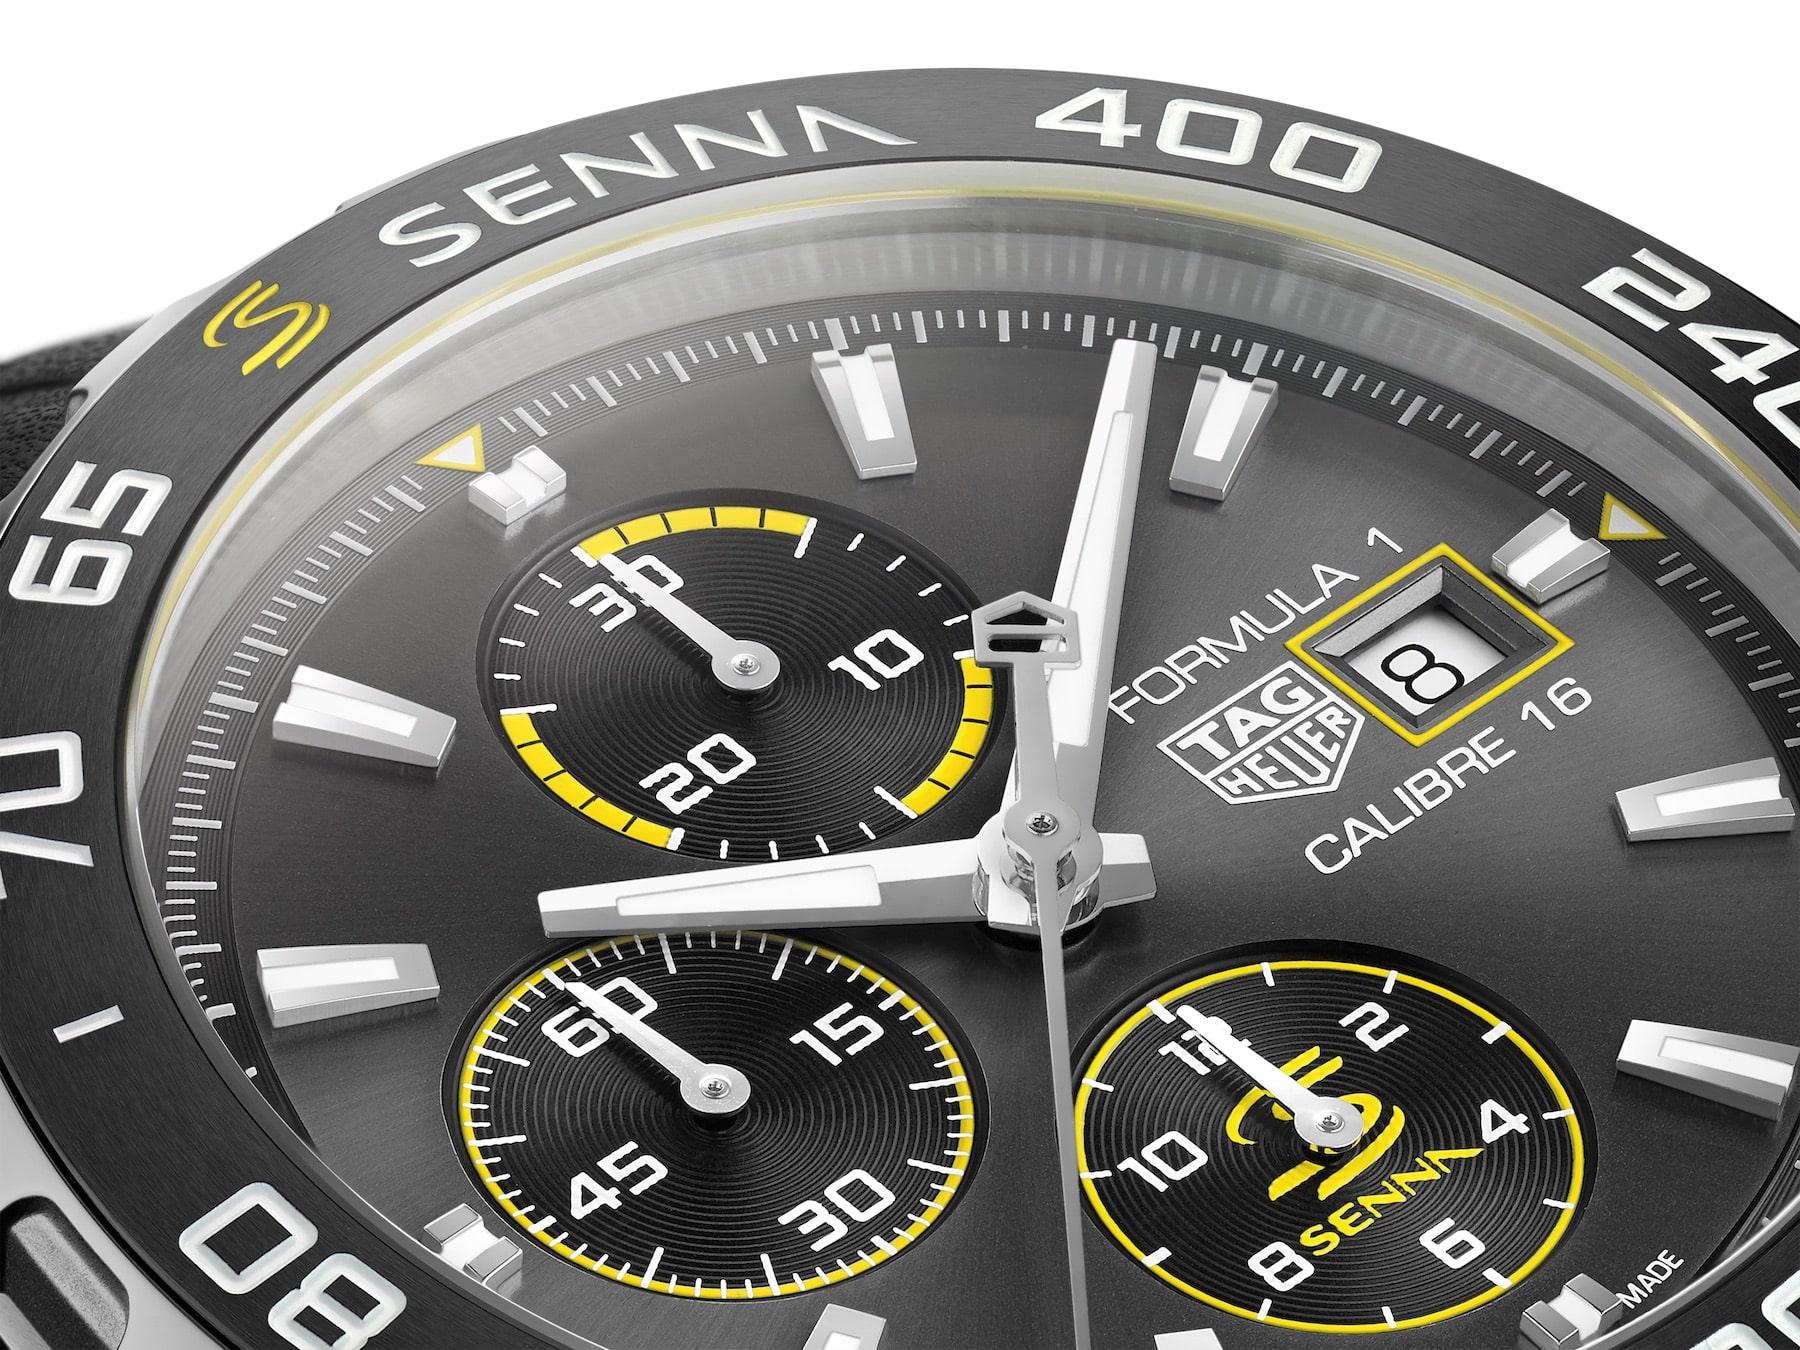 TAG Heuer Formula 1 Senna Special Edition 2020 automatic chronograph 4 min